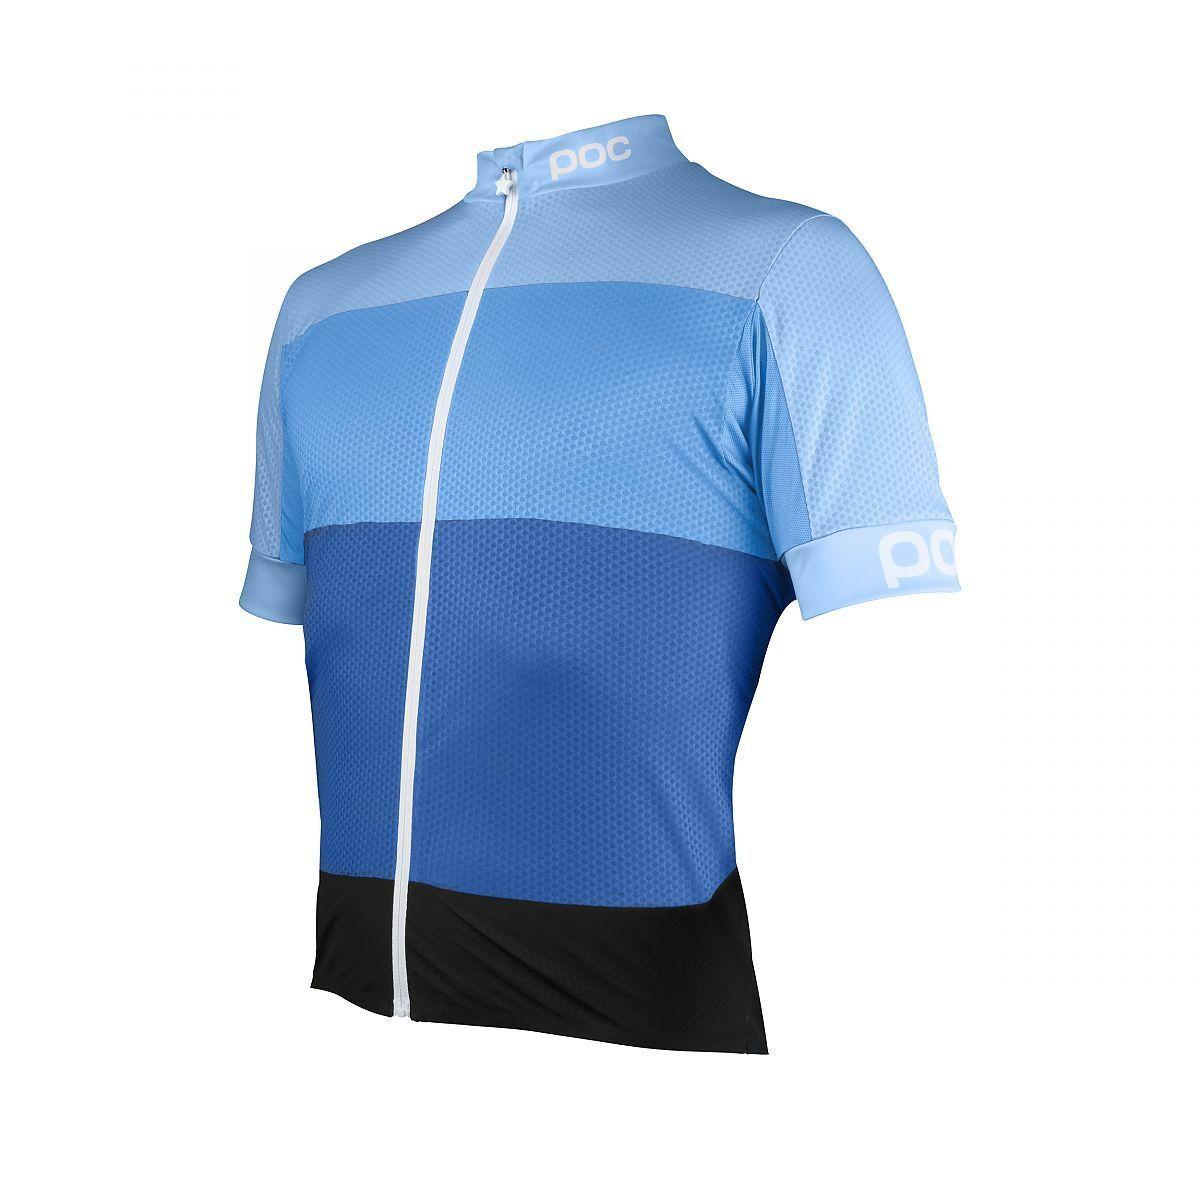 POC hommes FONDO LIGHT Bike Jersey - 2017